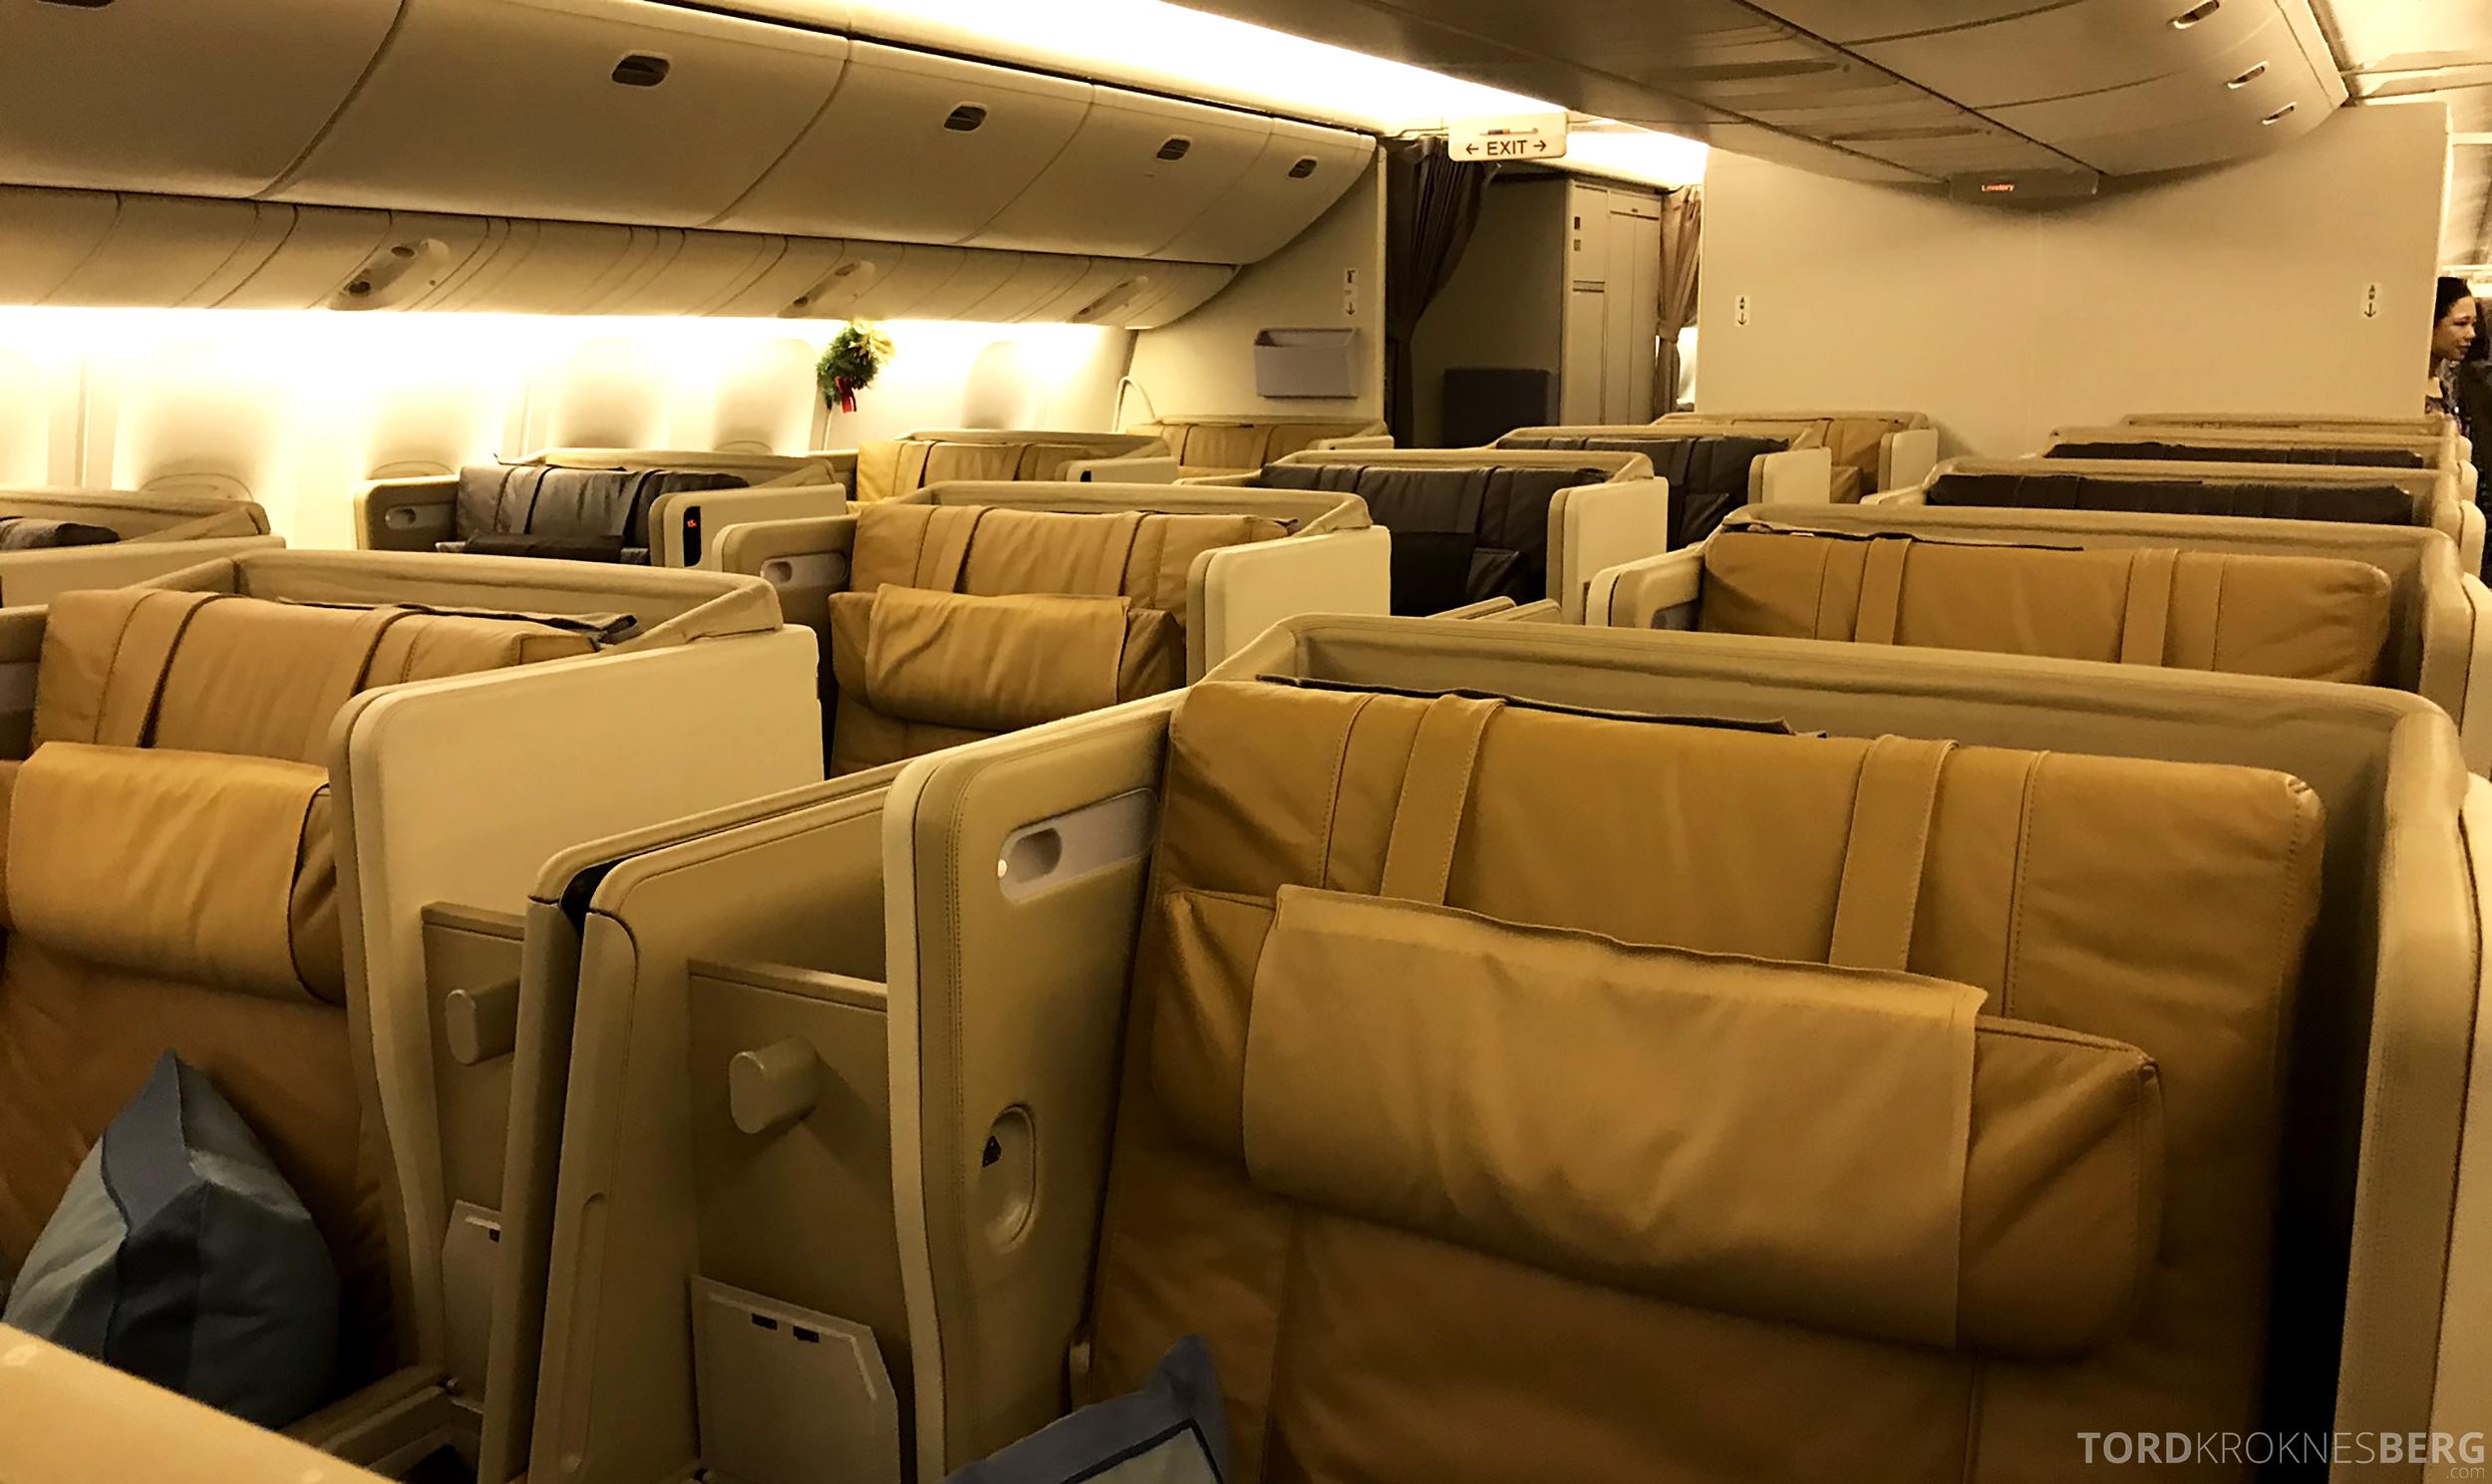 Singapore Airlines Business Class Brisbane utdatert kabin